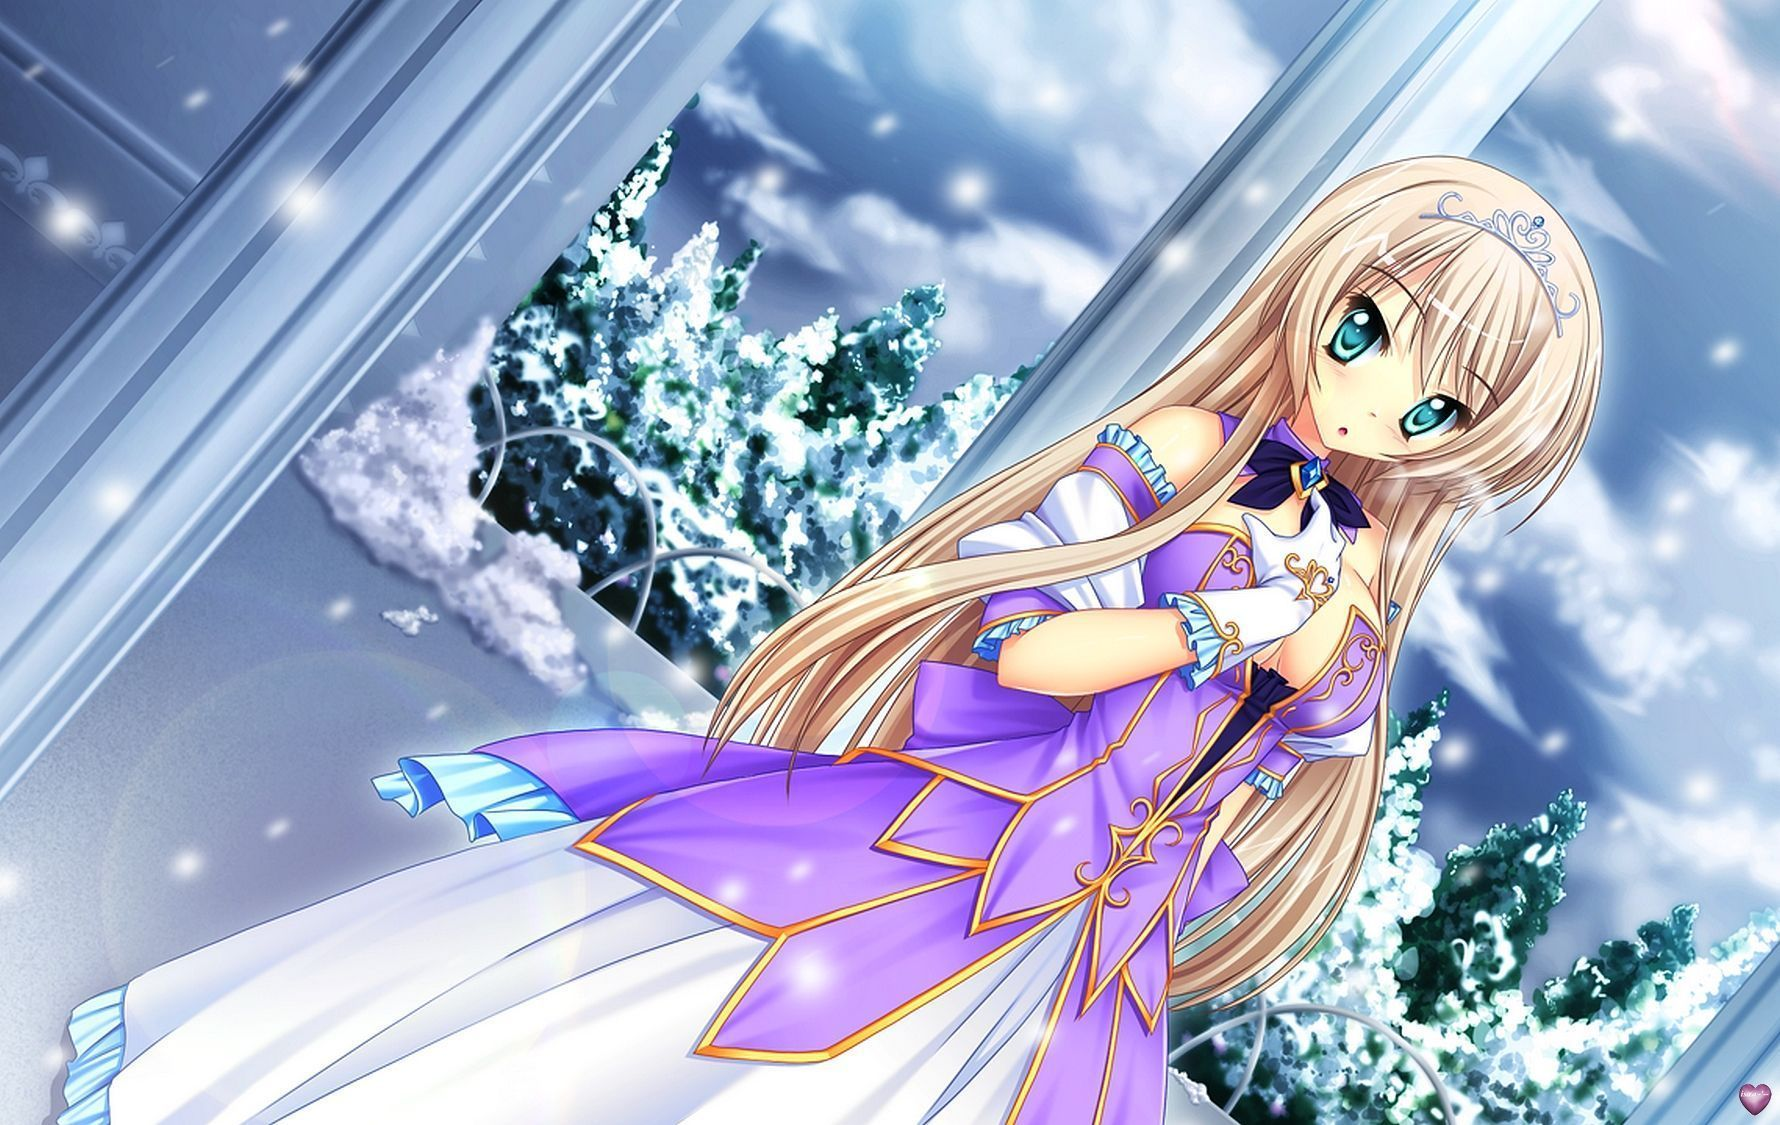 La belle princesse fond d 39 cran manga - Image de manga fille ...